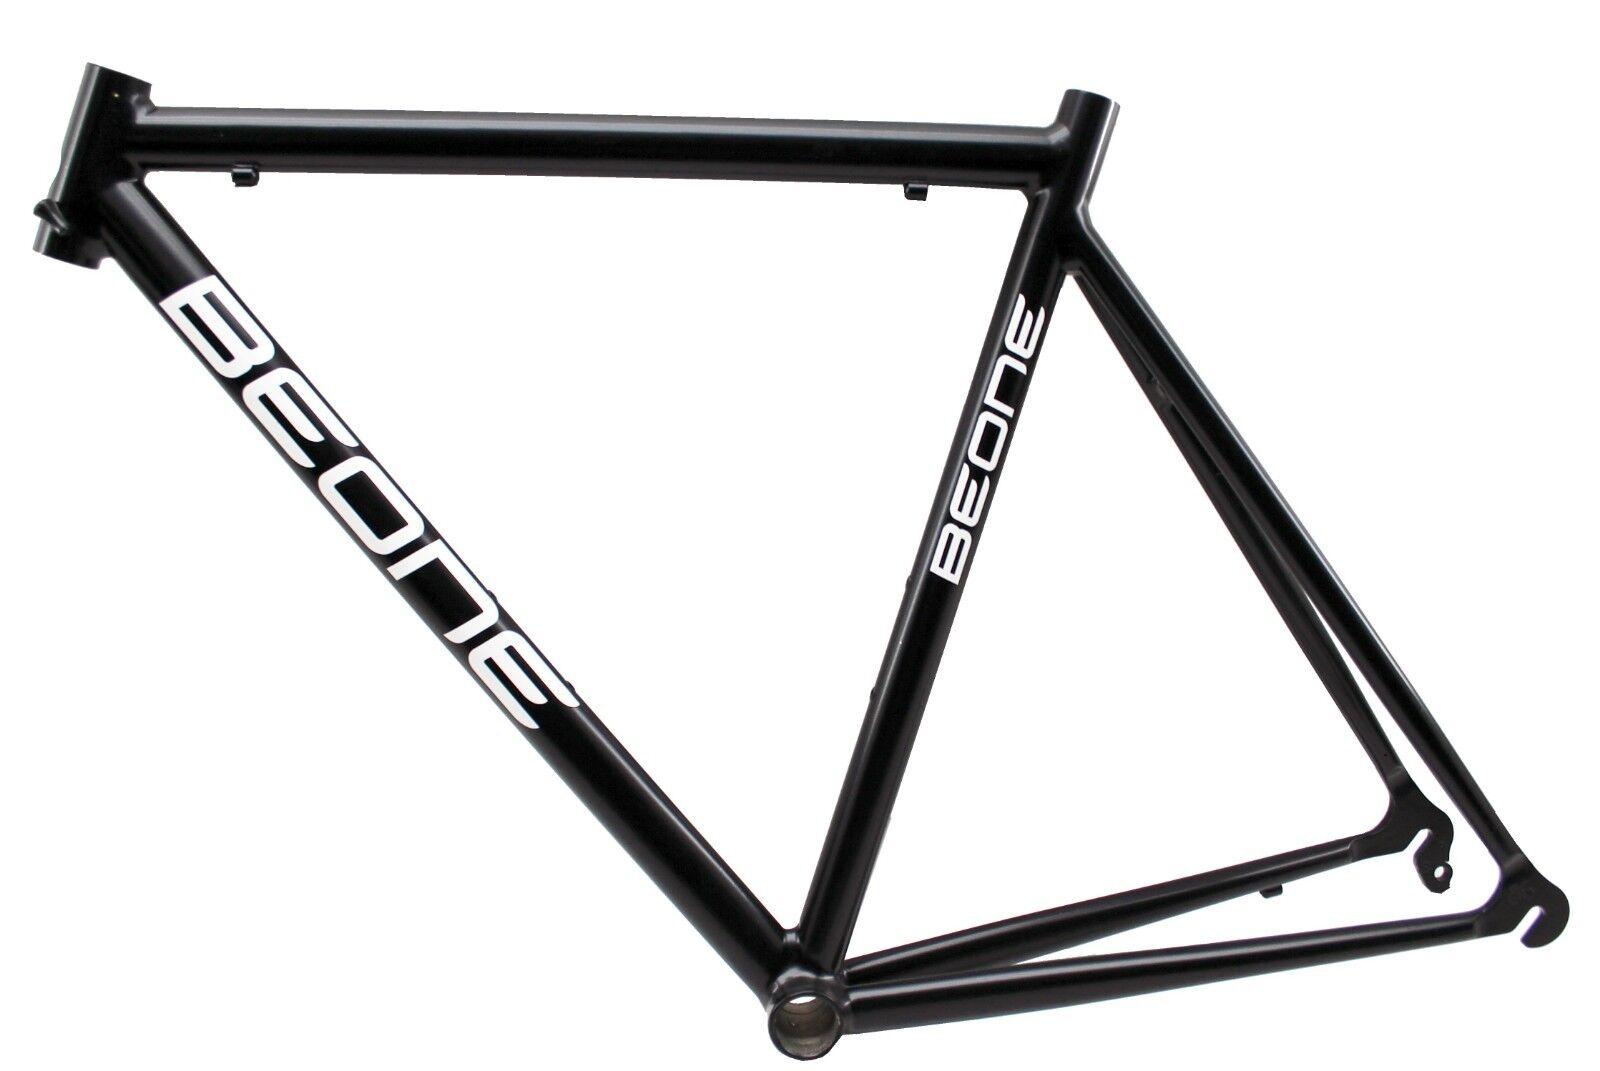 Men's Road Bike Beone Aluminium Frame, 28  , Fh 54 cm, BSA Lagermaß